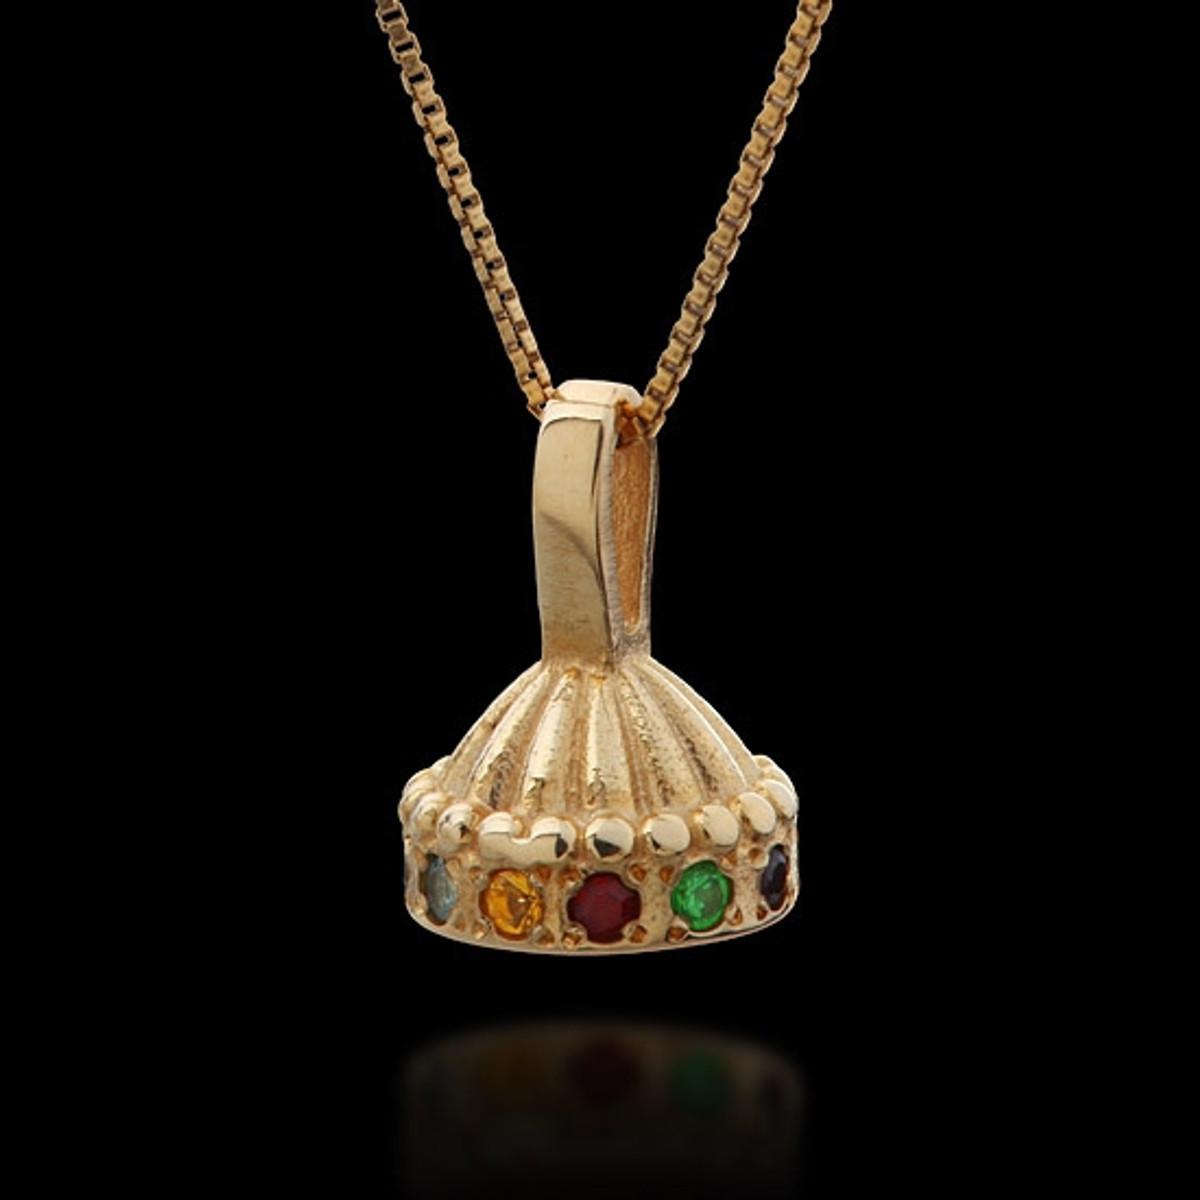 Haari Kabbalah Hoshen Crown Pendant